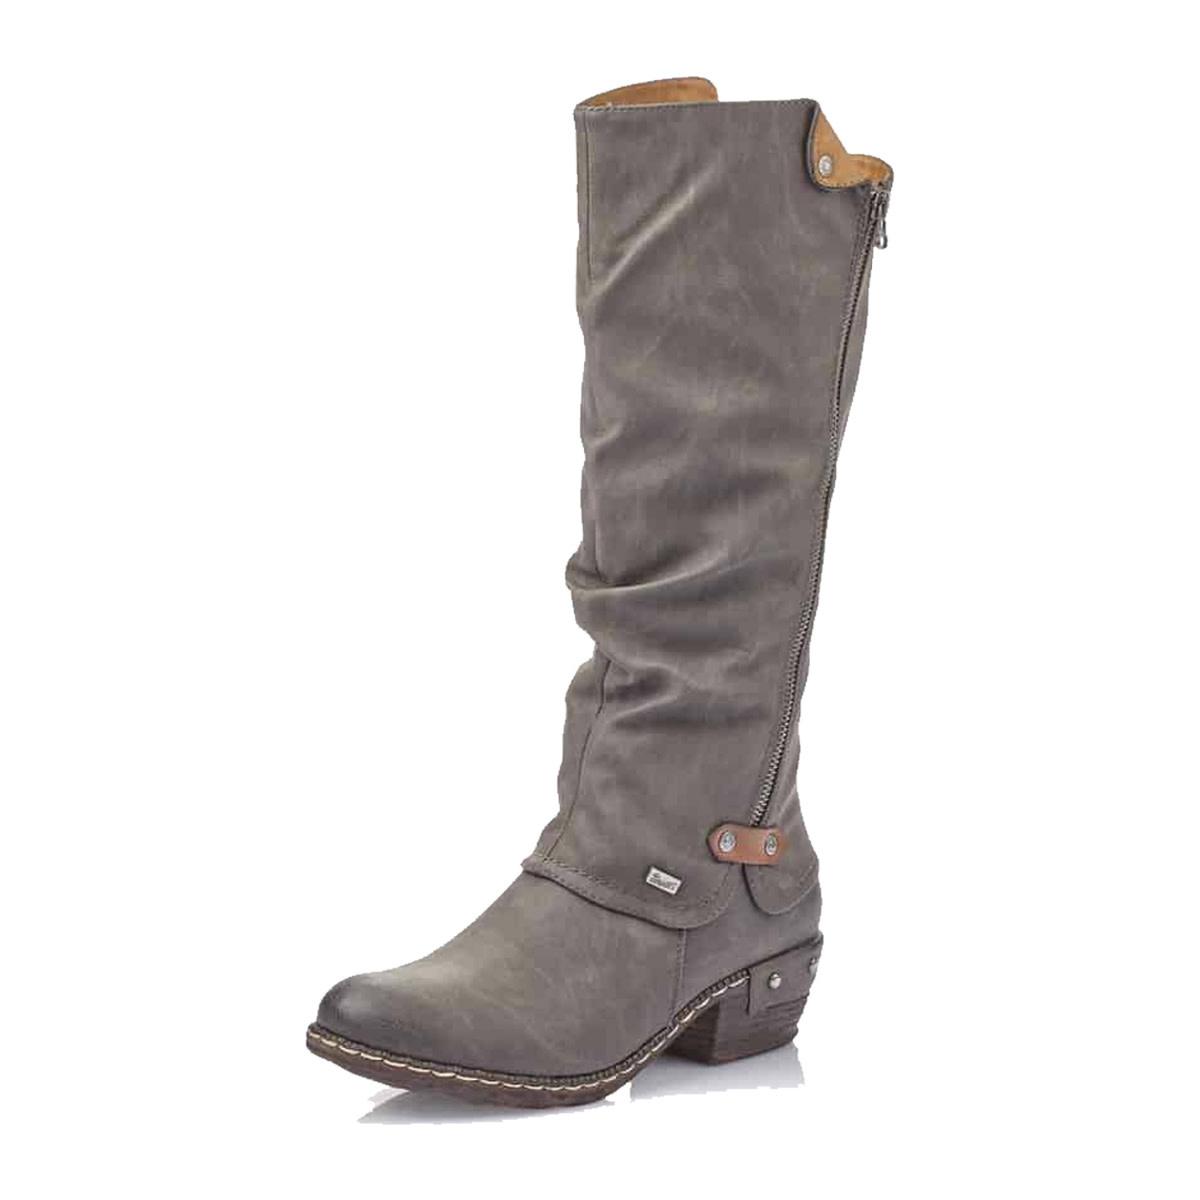 Rieker Rieker Women's 93655-45 Grey